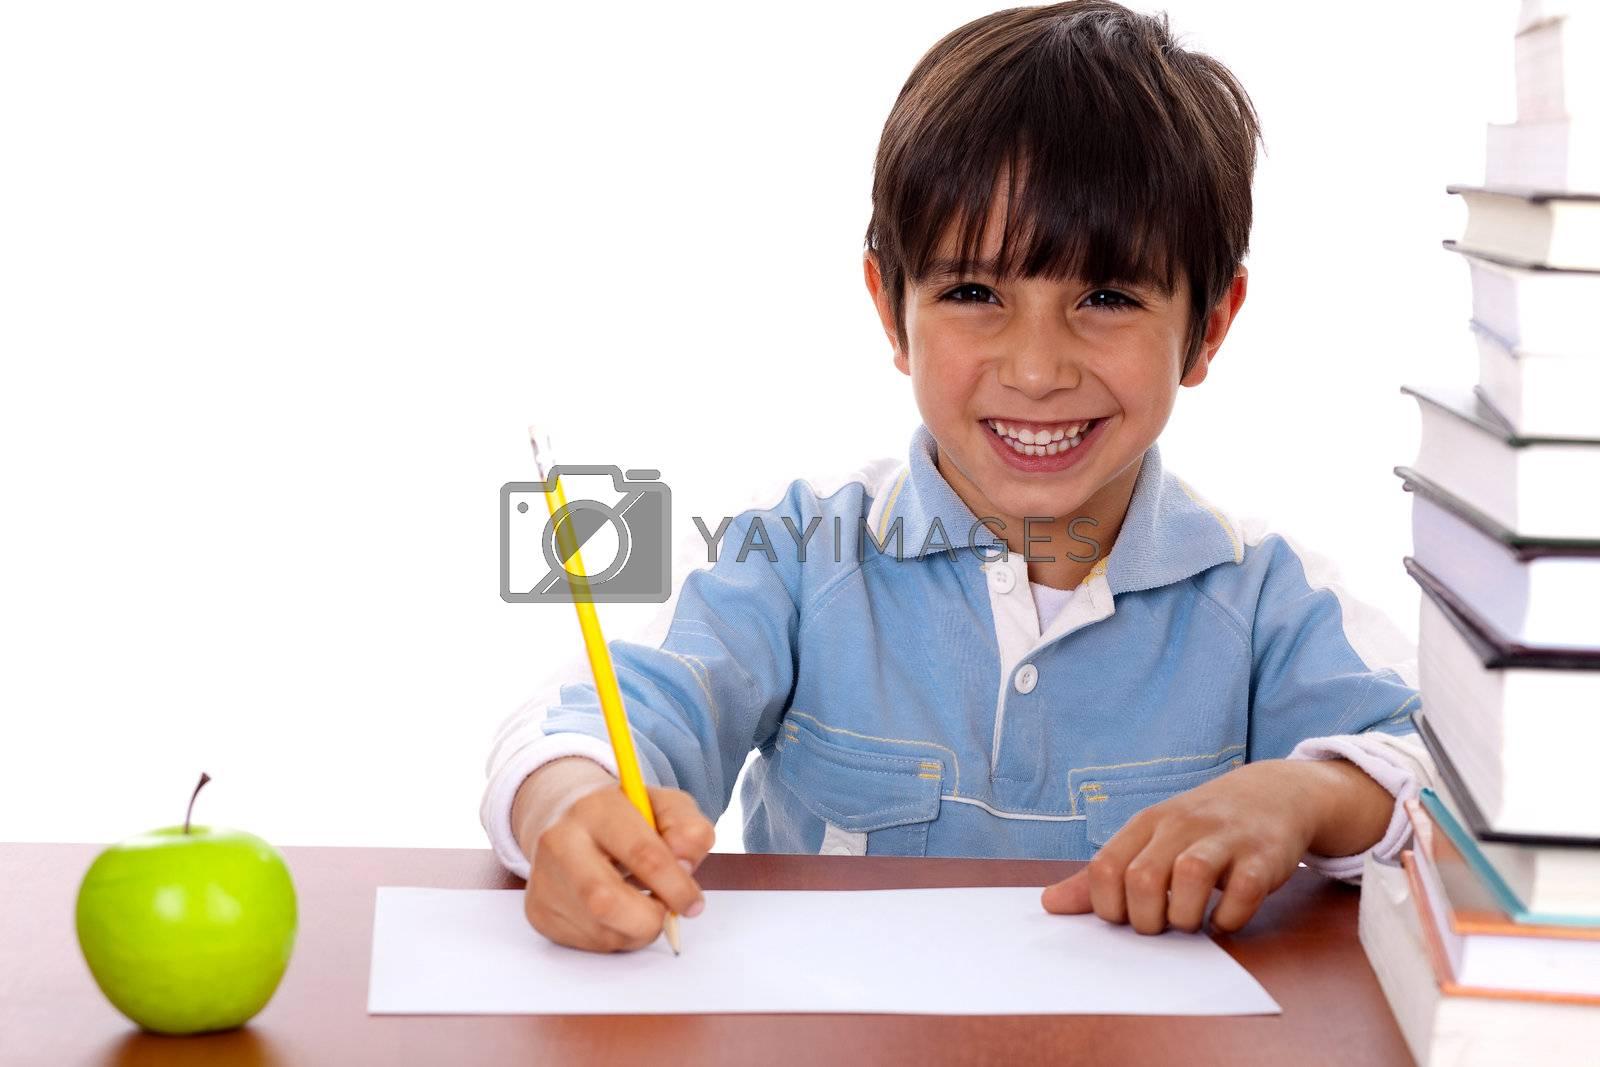 Young kid enjoying art as he draws on blank sheet of paper